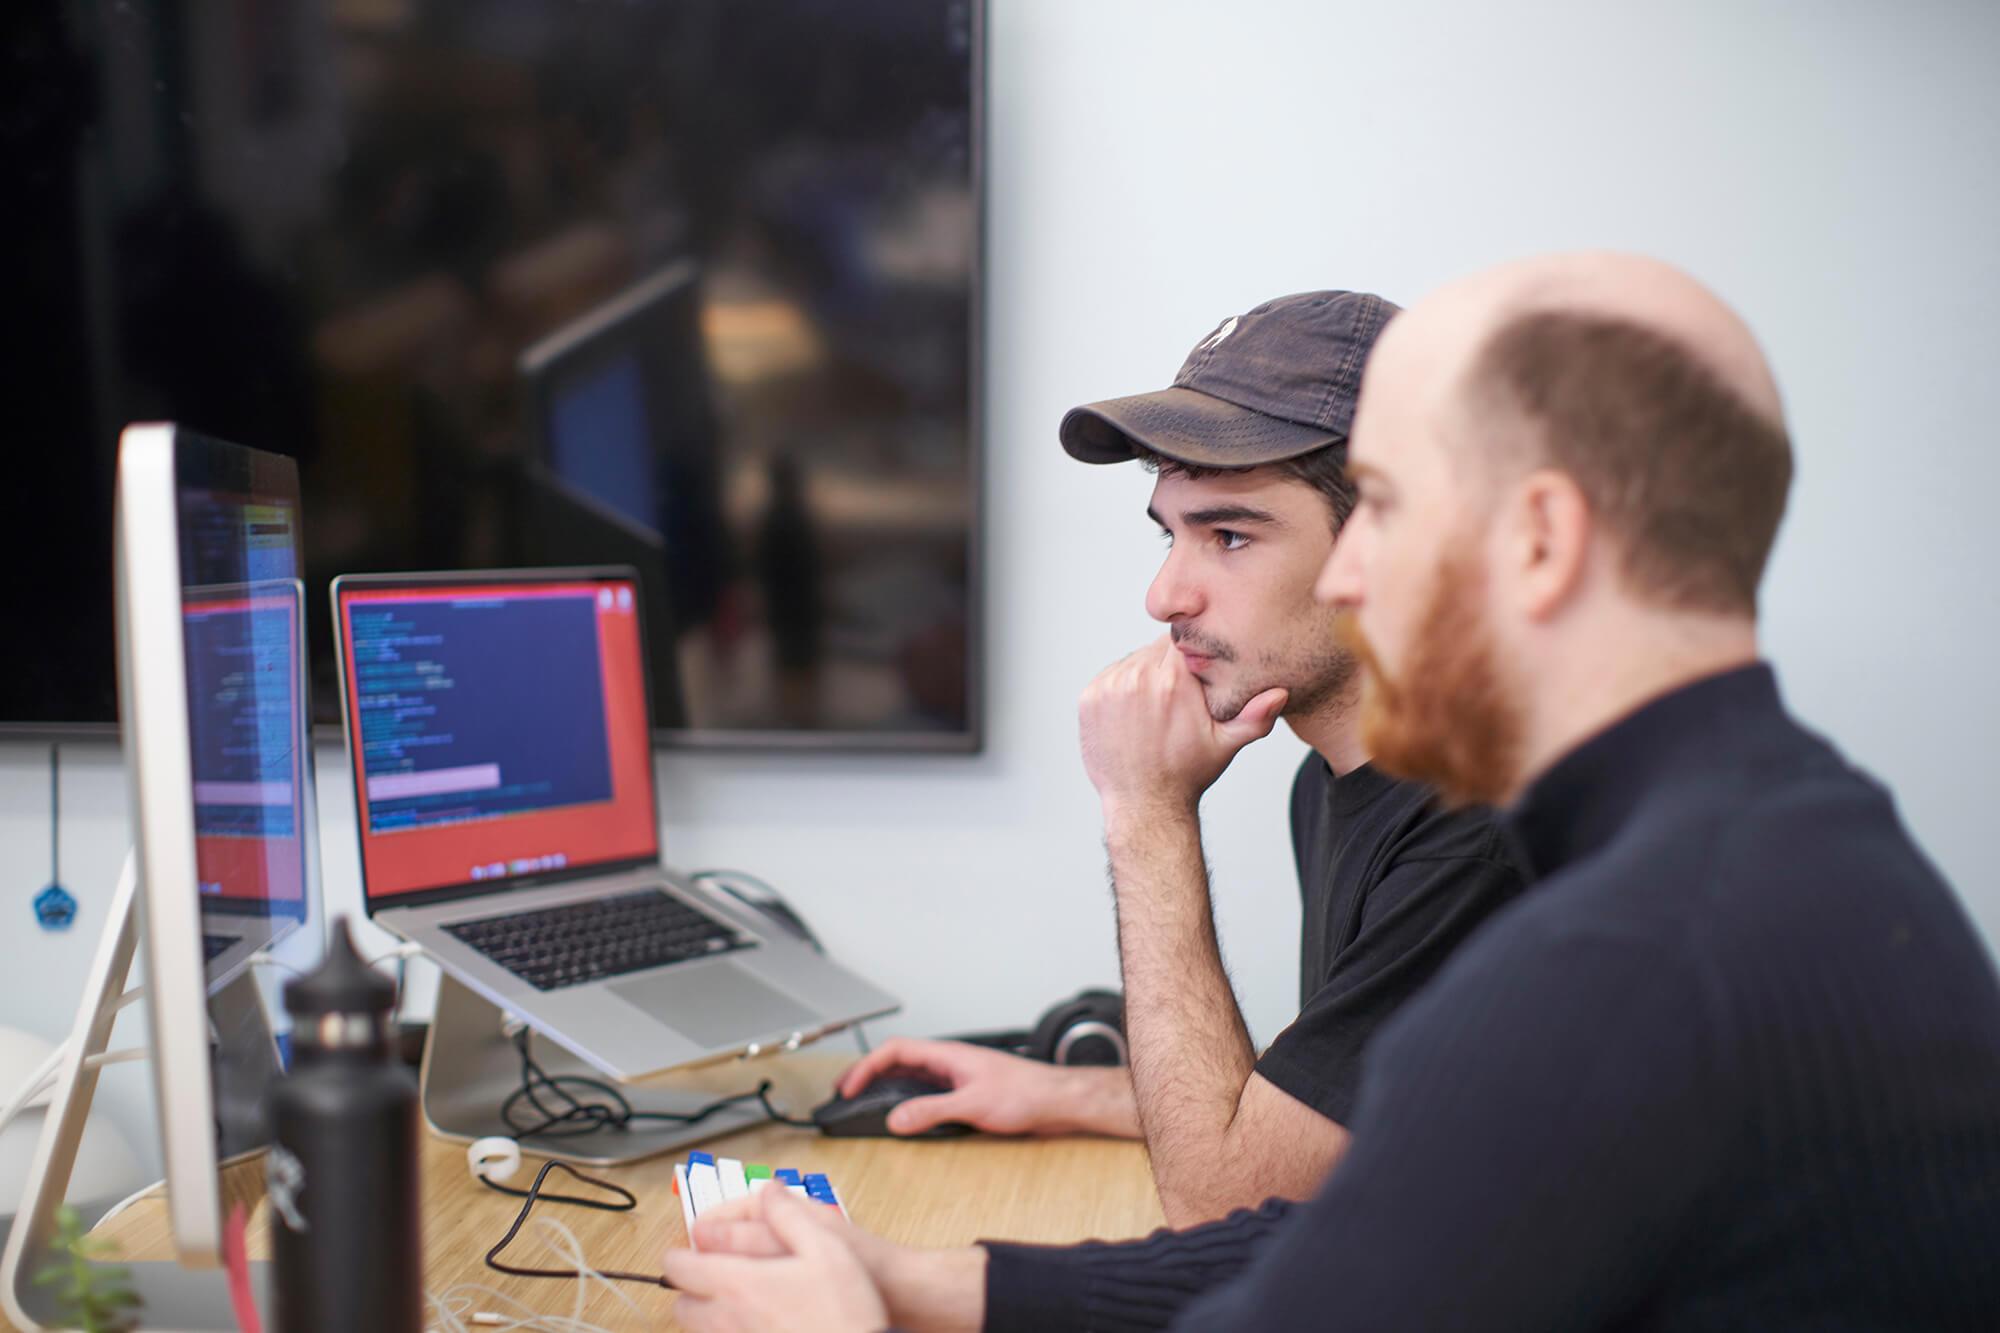 Two members of the Hologram engineering team pair programming in the Hologram office